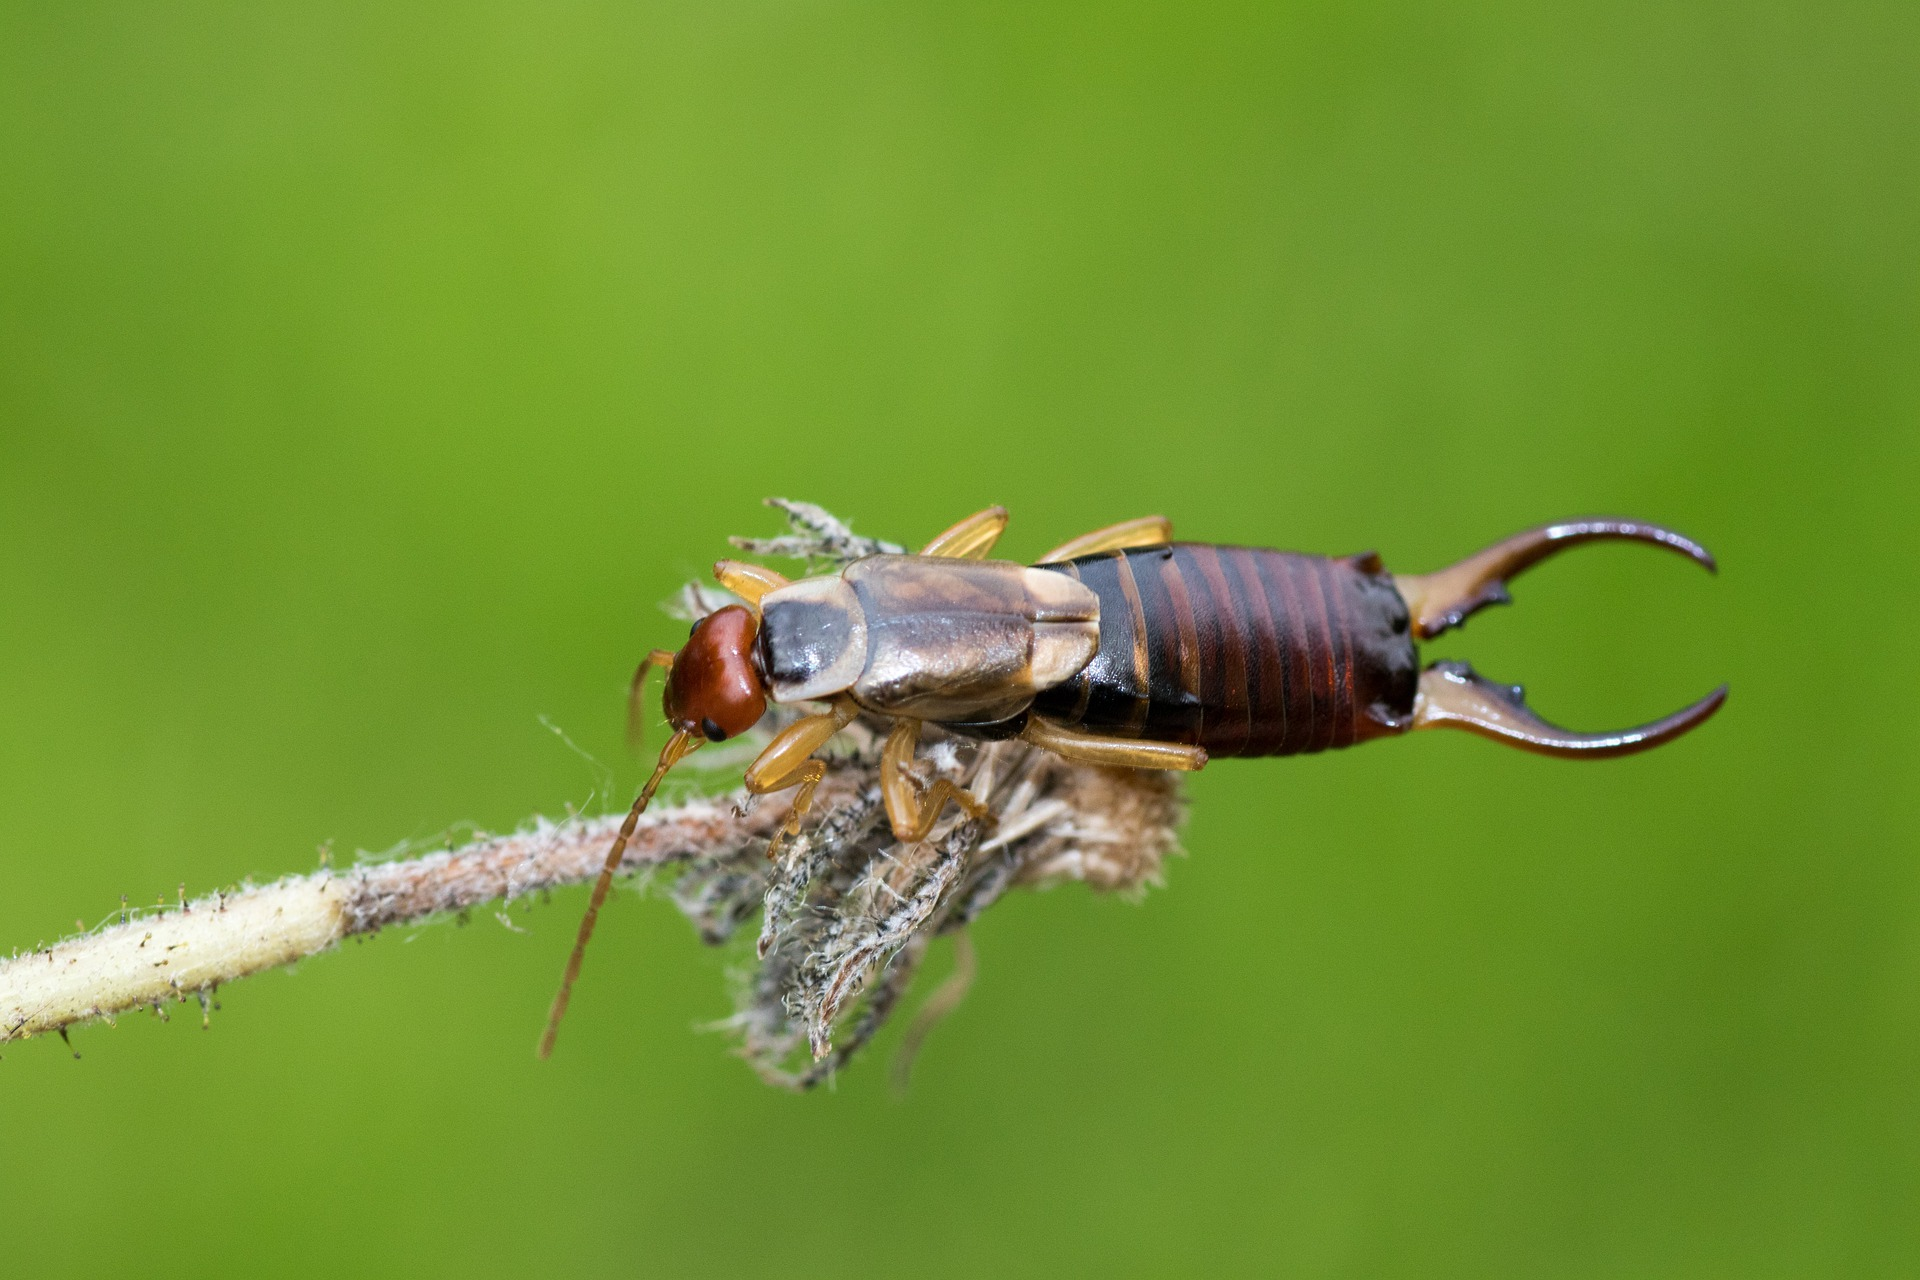 Forficula auricularia adult male